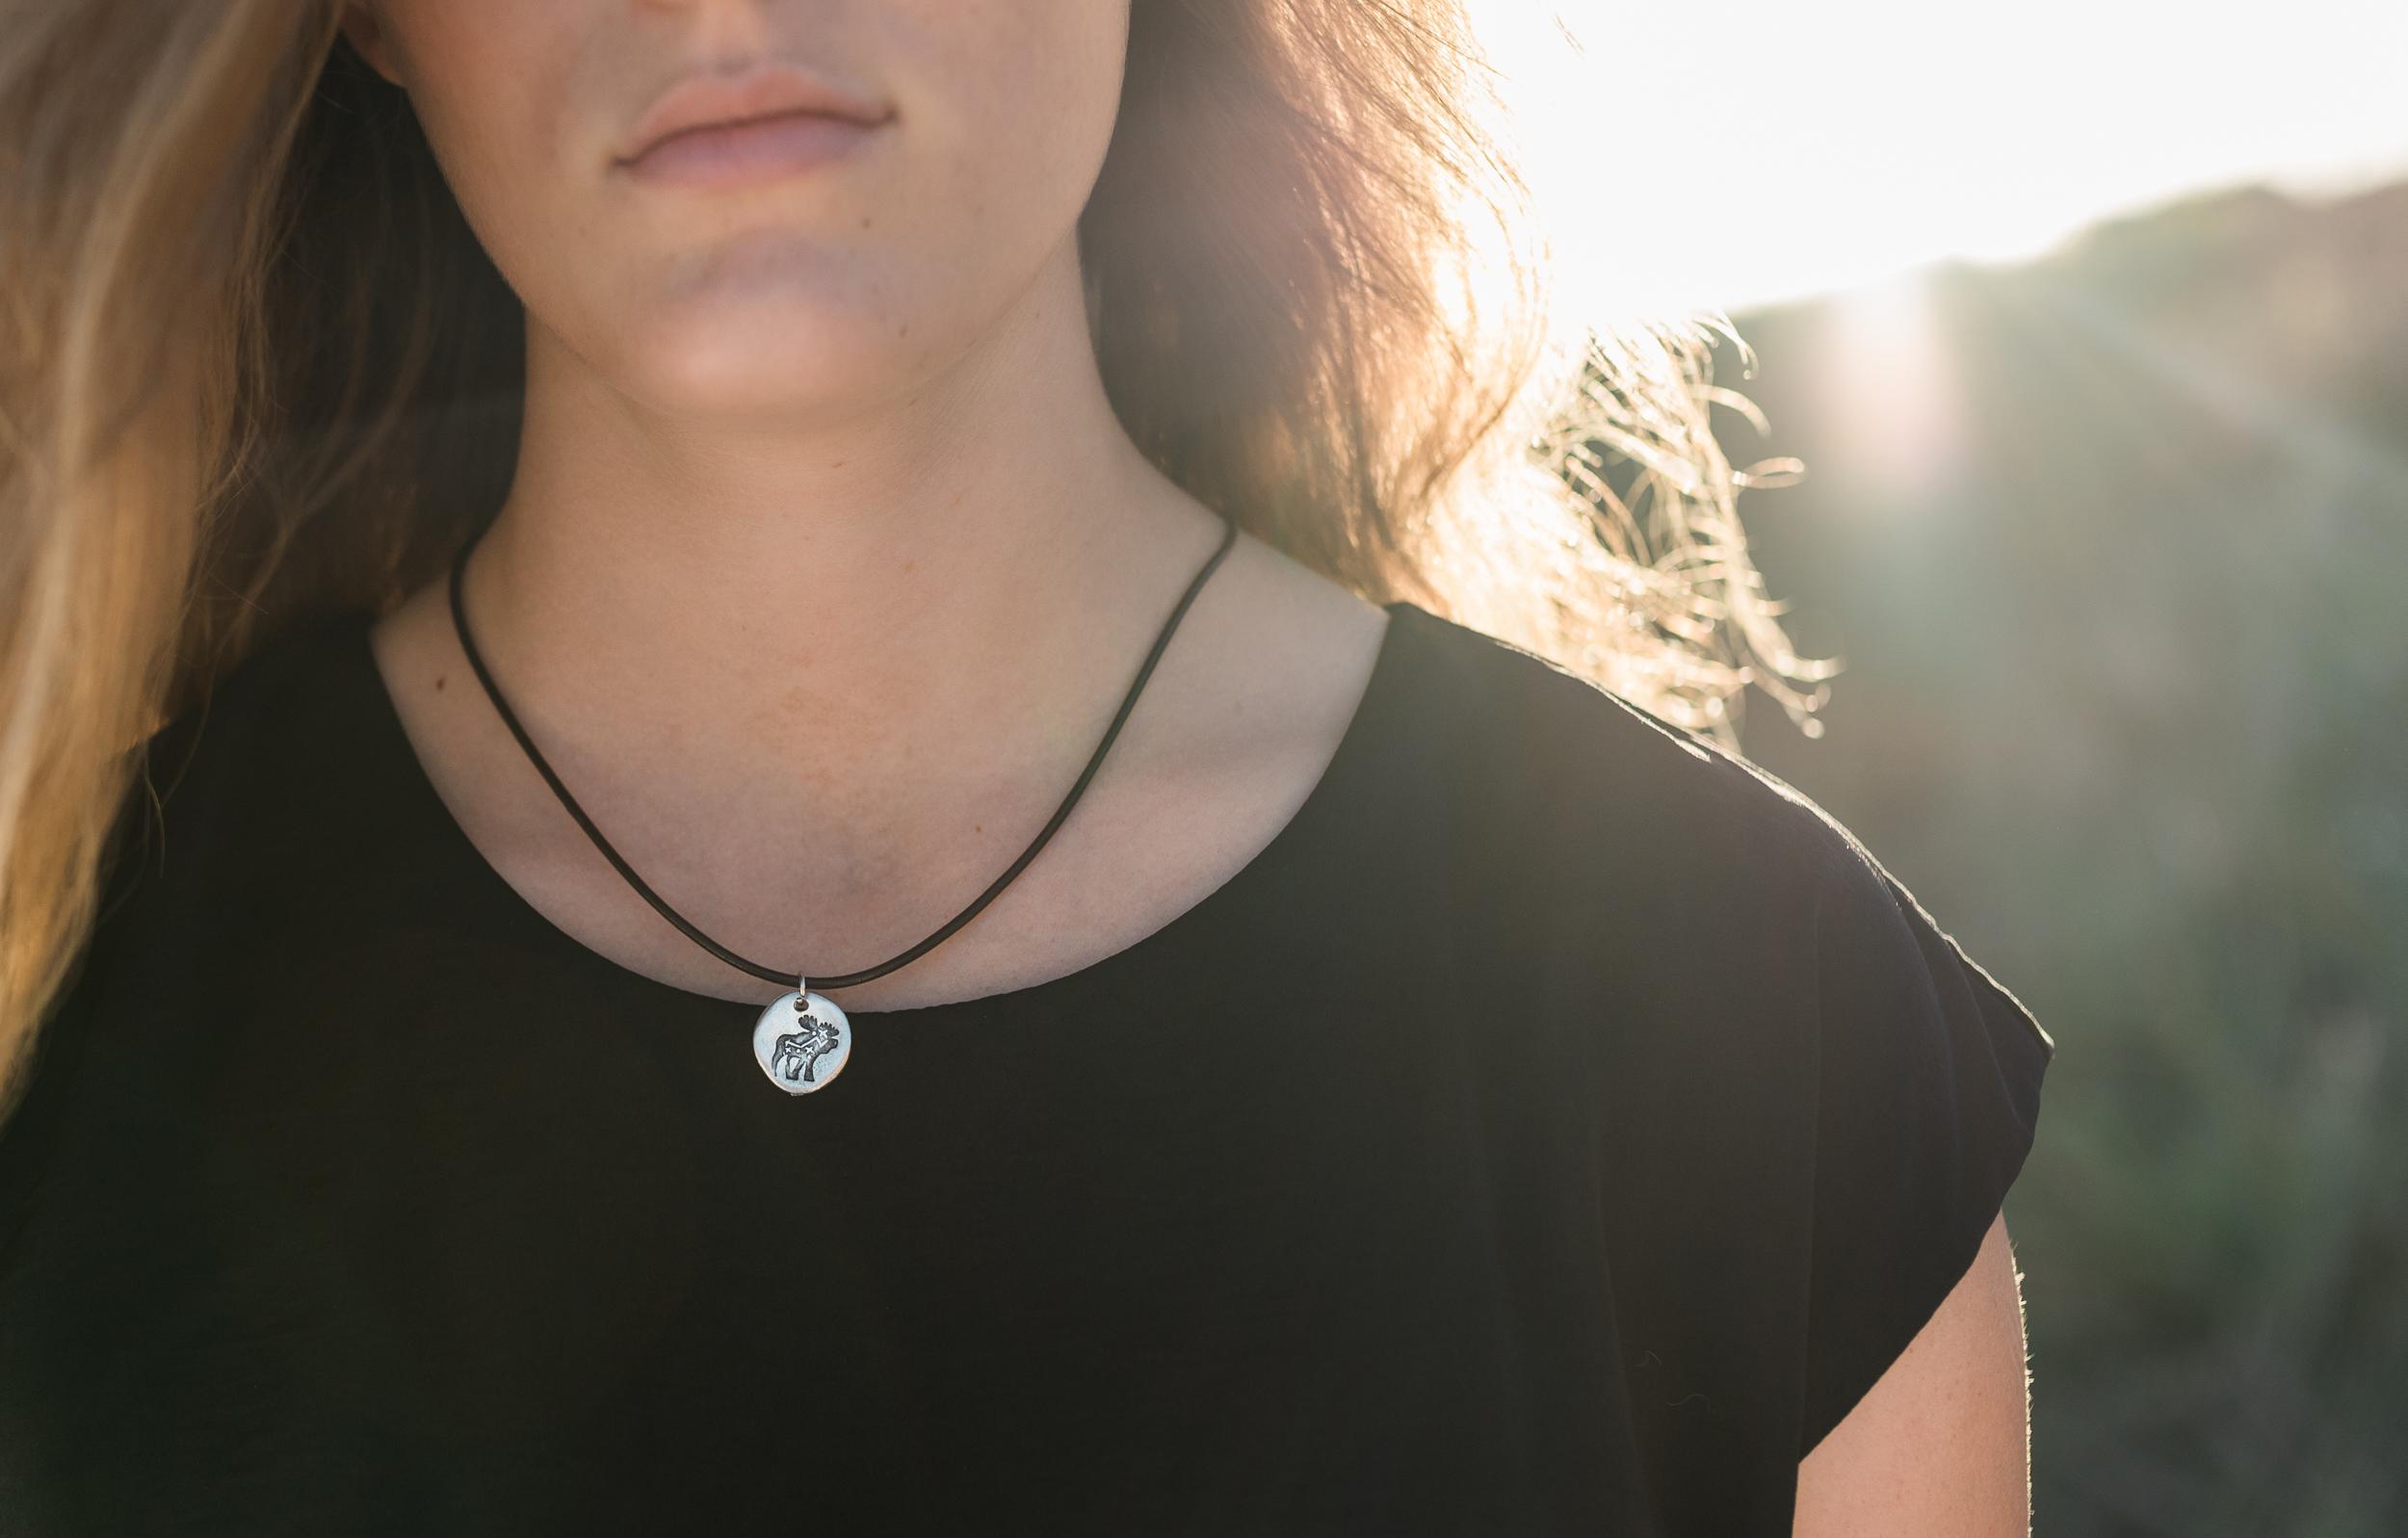 jewelry-branding-photography-guam-roxanne-augusta-21.jpg